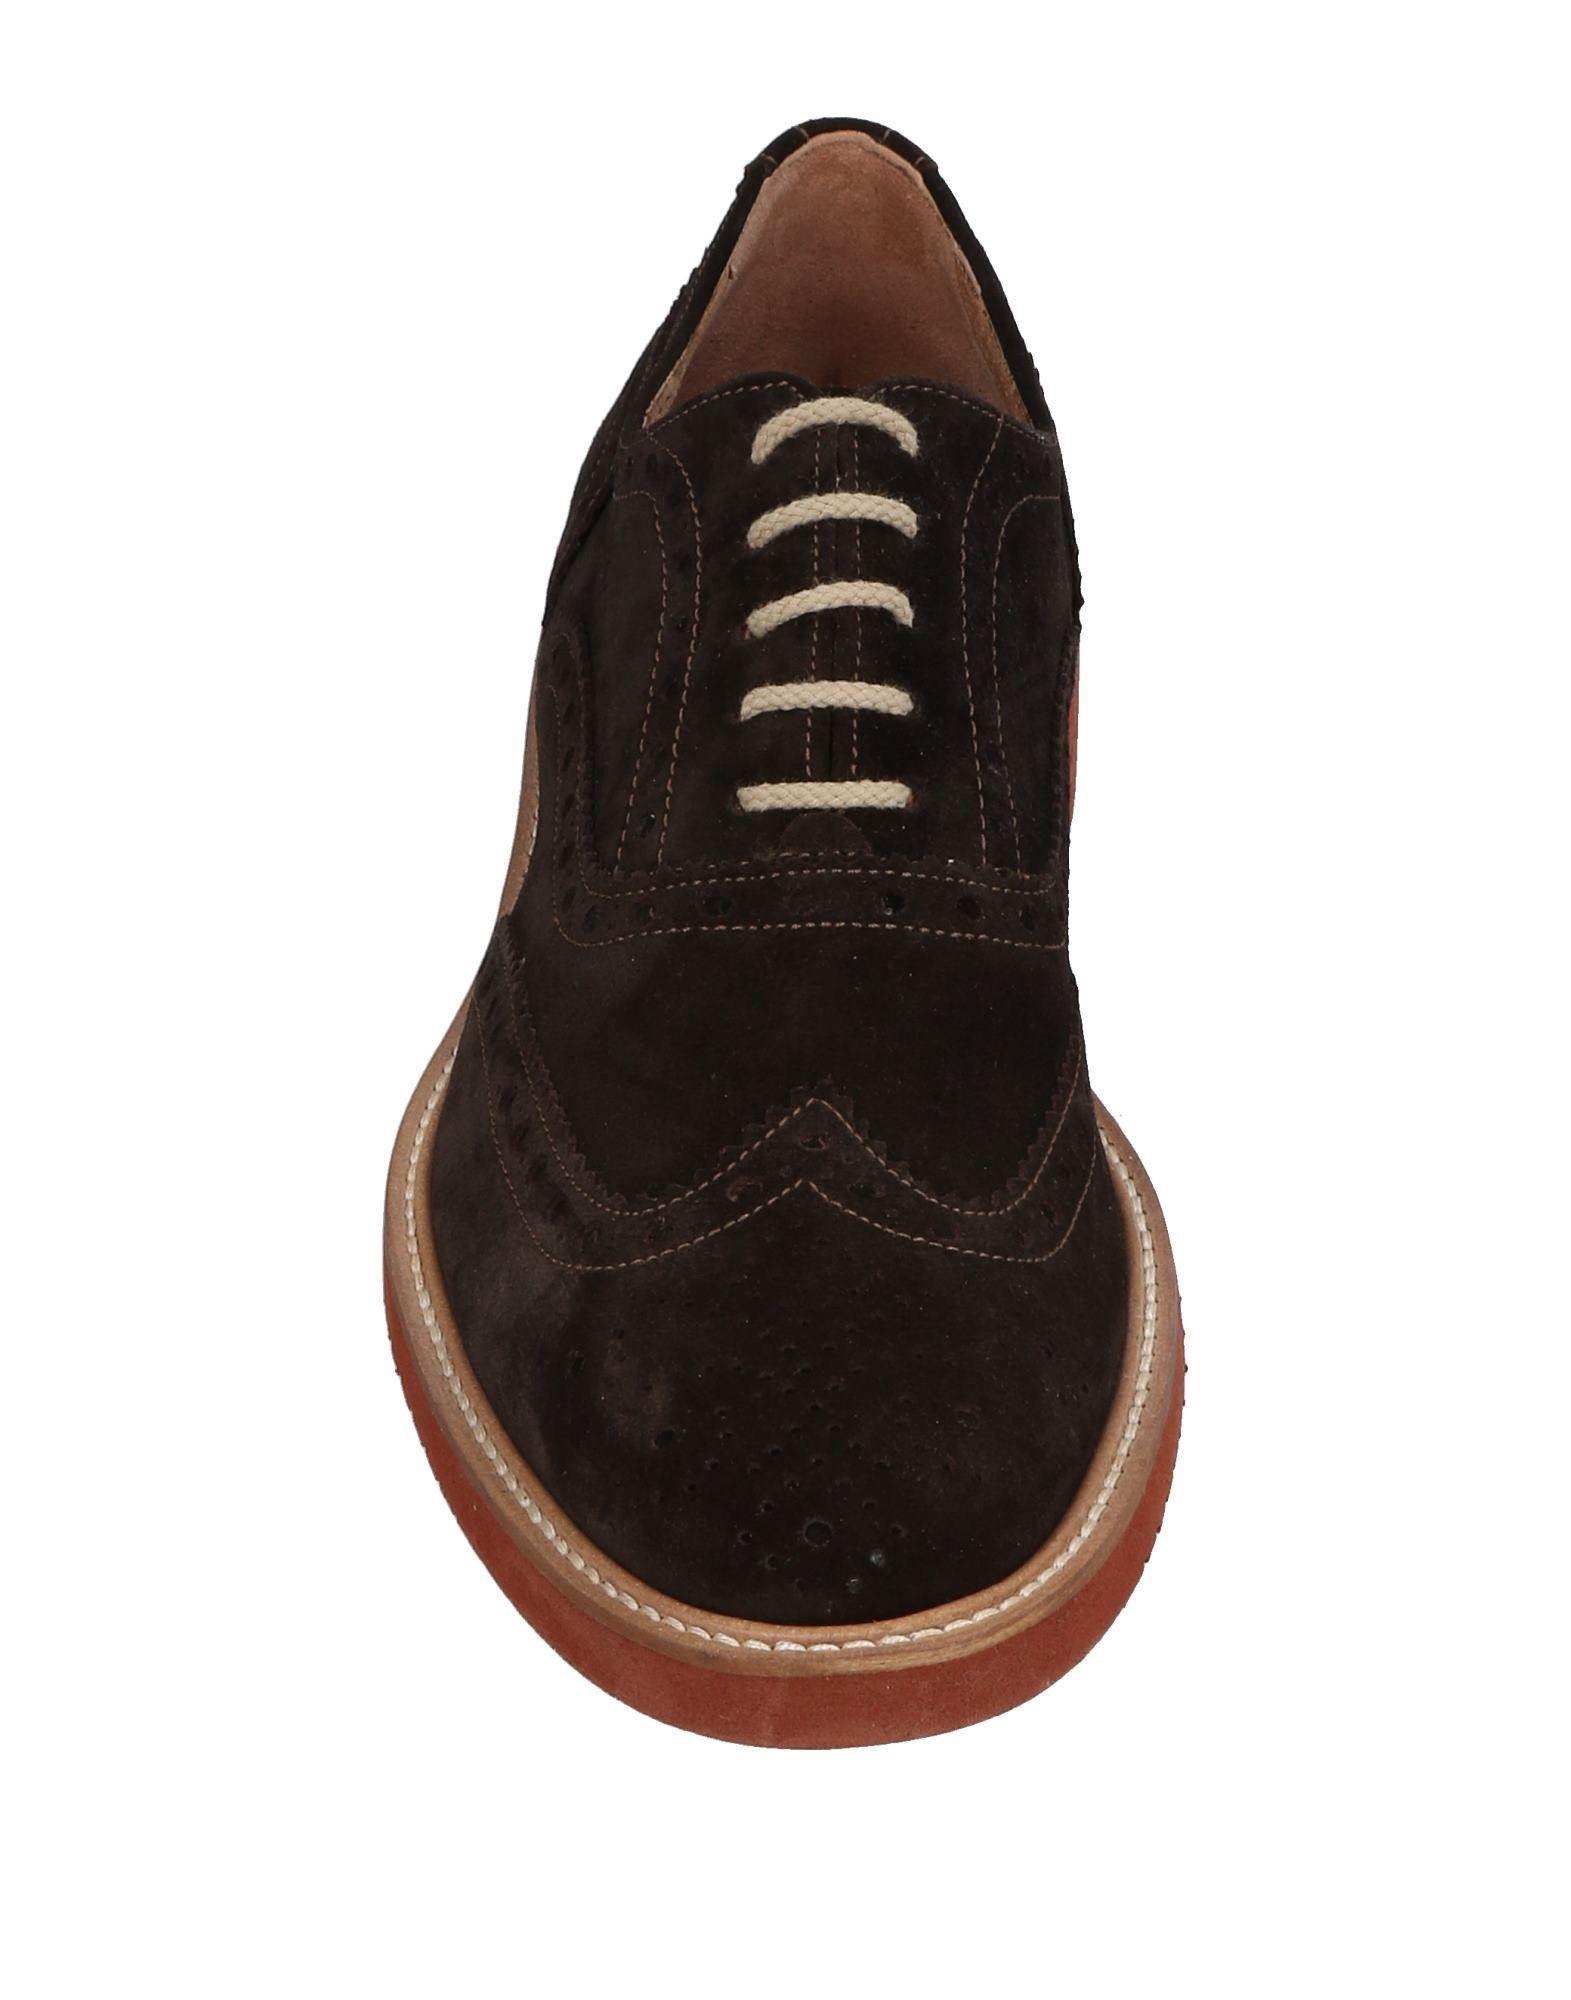 CHAUSSURES - Chaussures à lacetsAlexander Trend htSm4